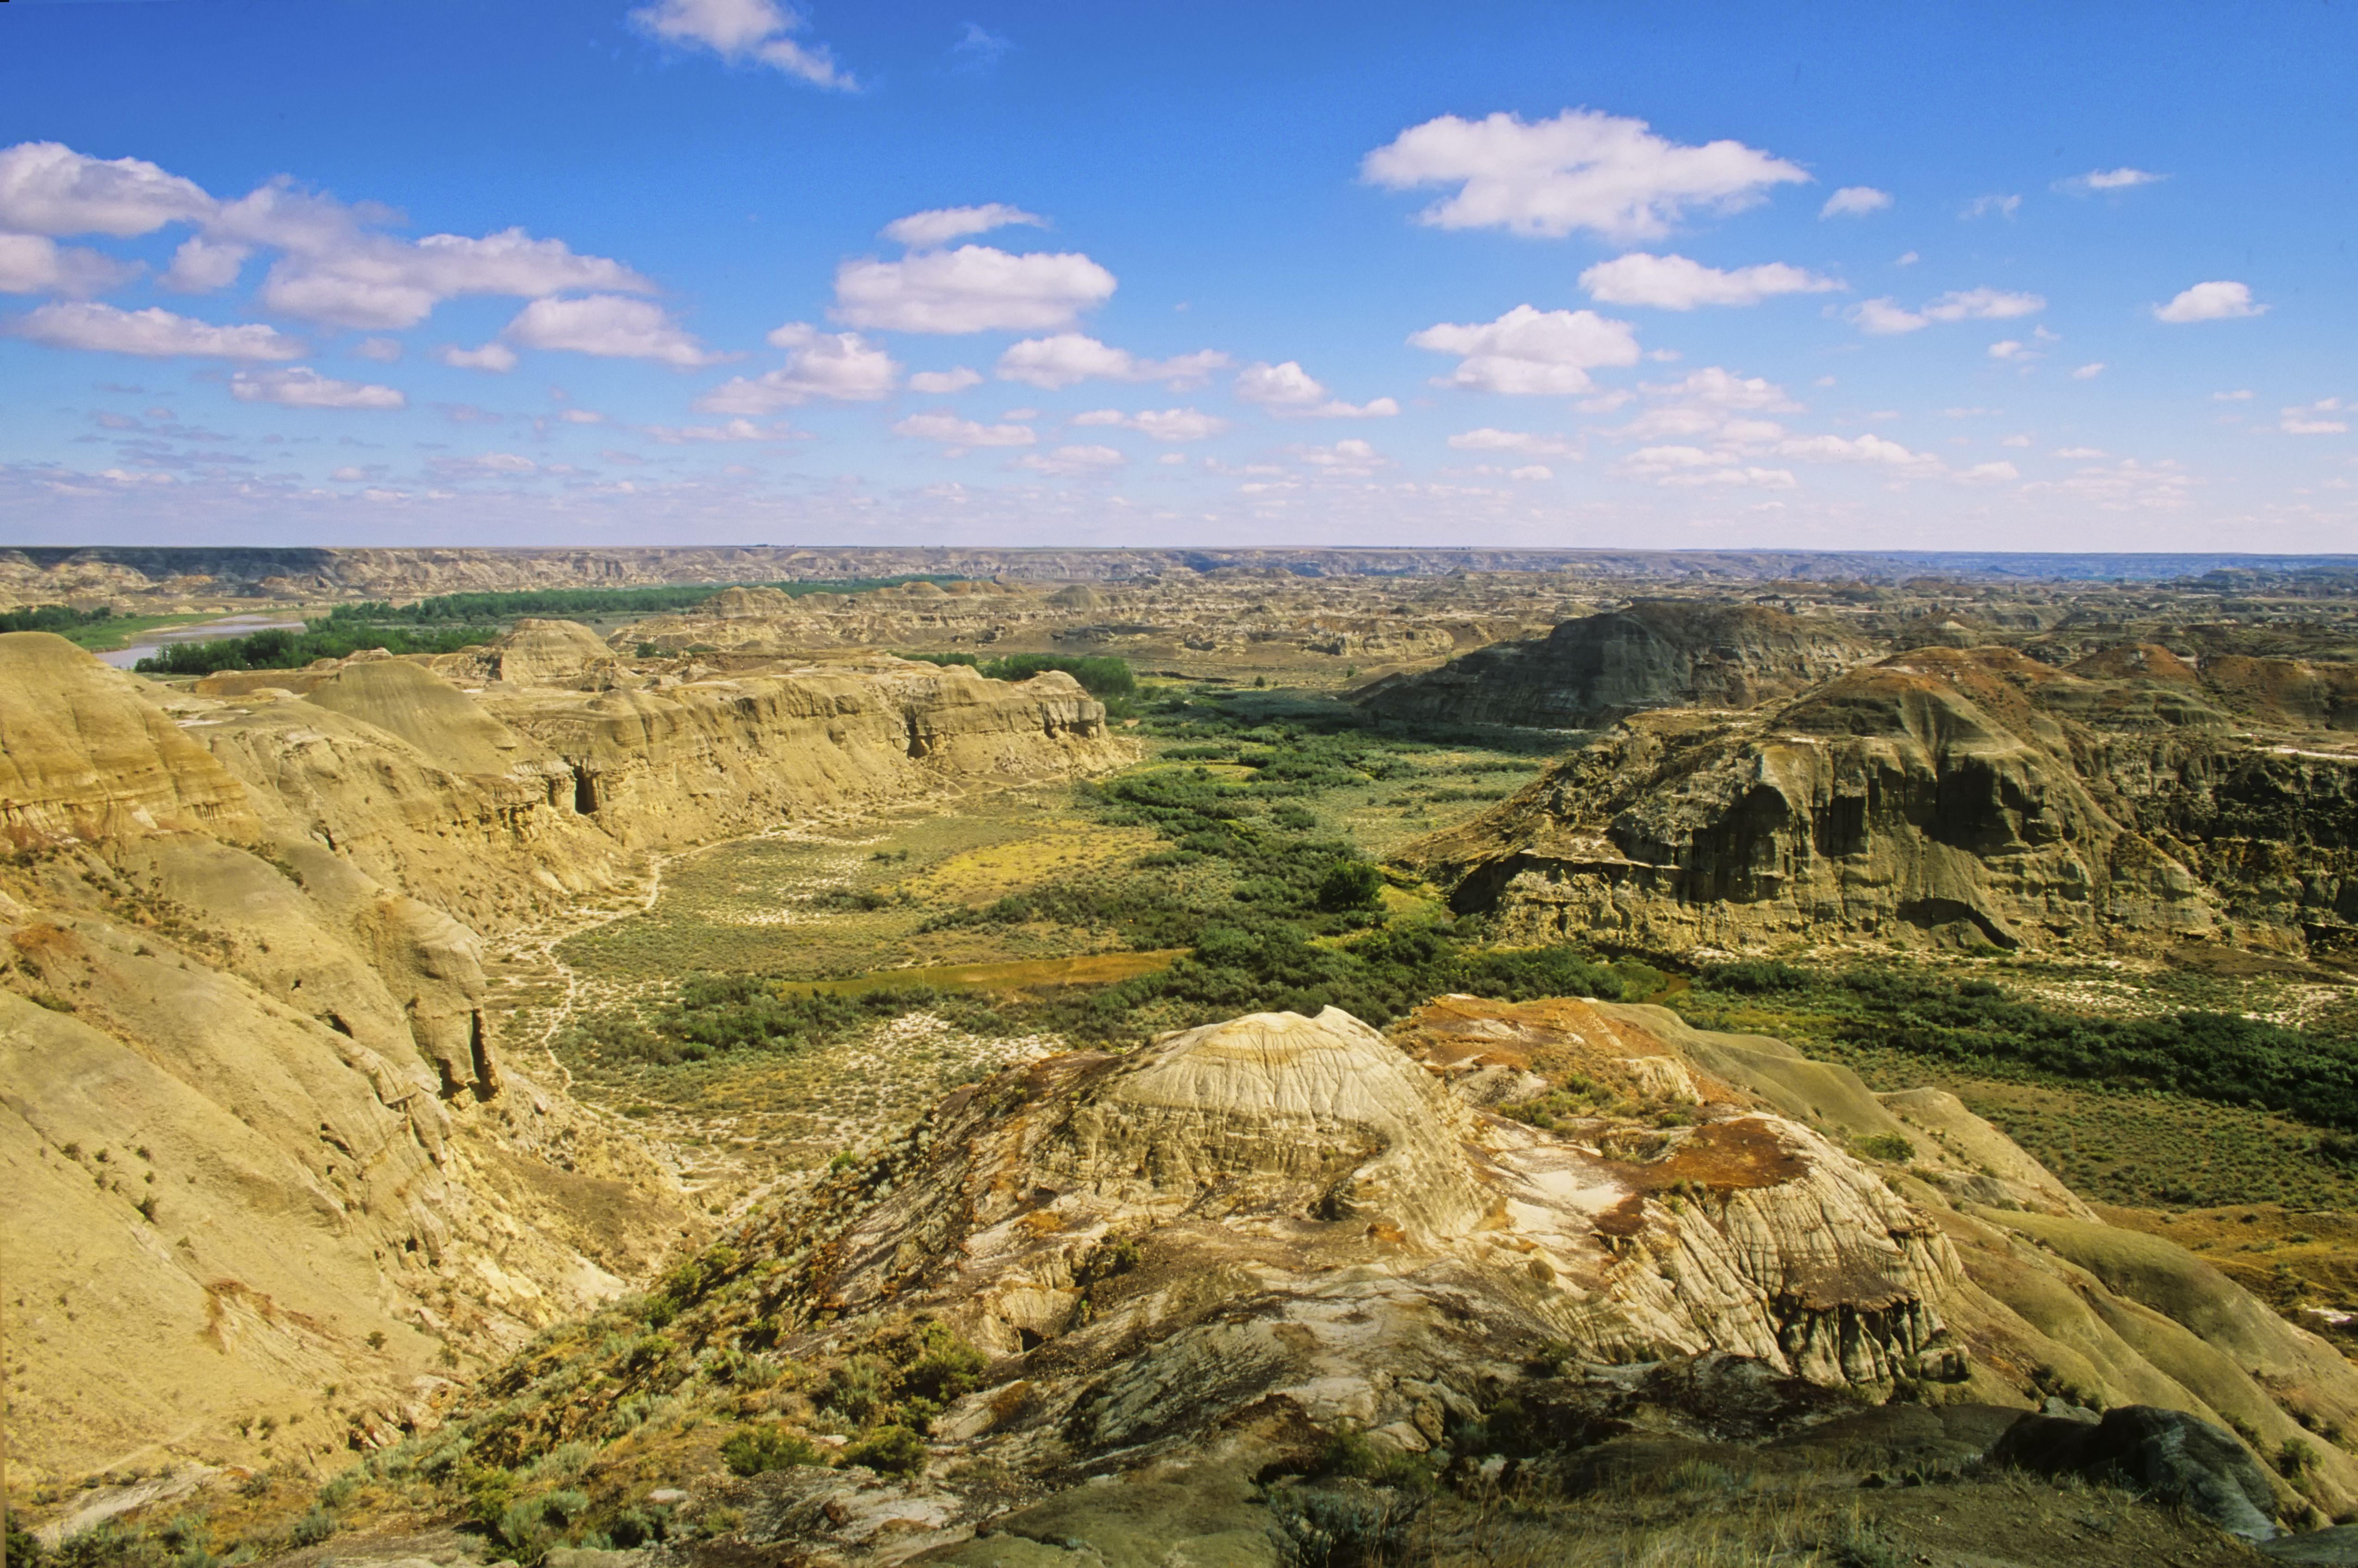 The rugged landscape of Dinosaur Provincial Park, UNESCO World Heritage Site, Alberta, Canada